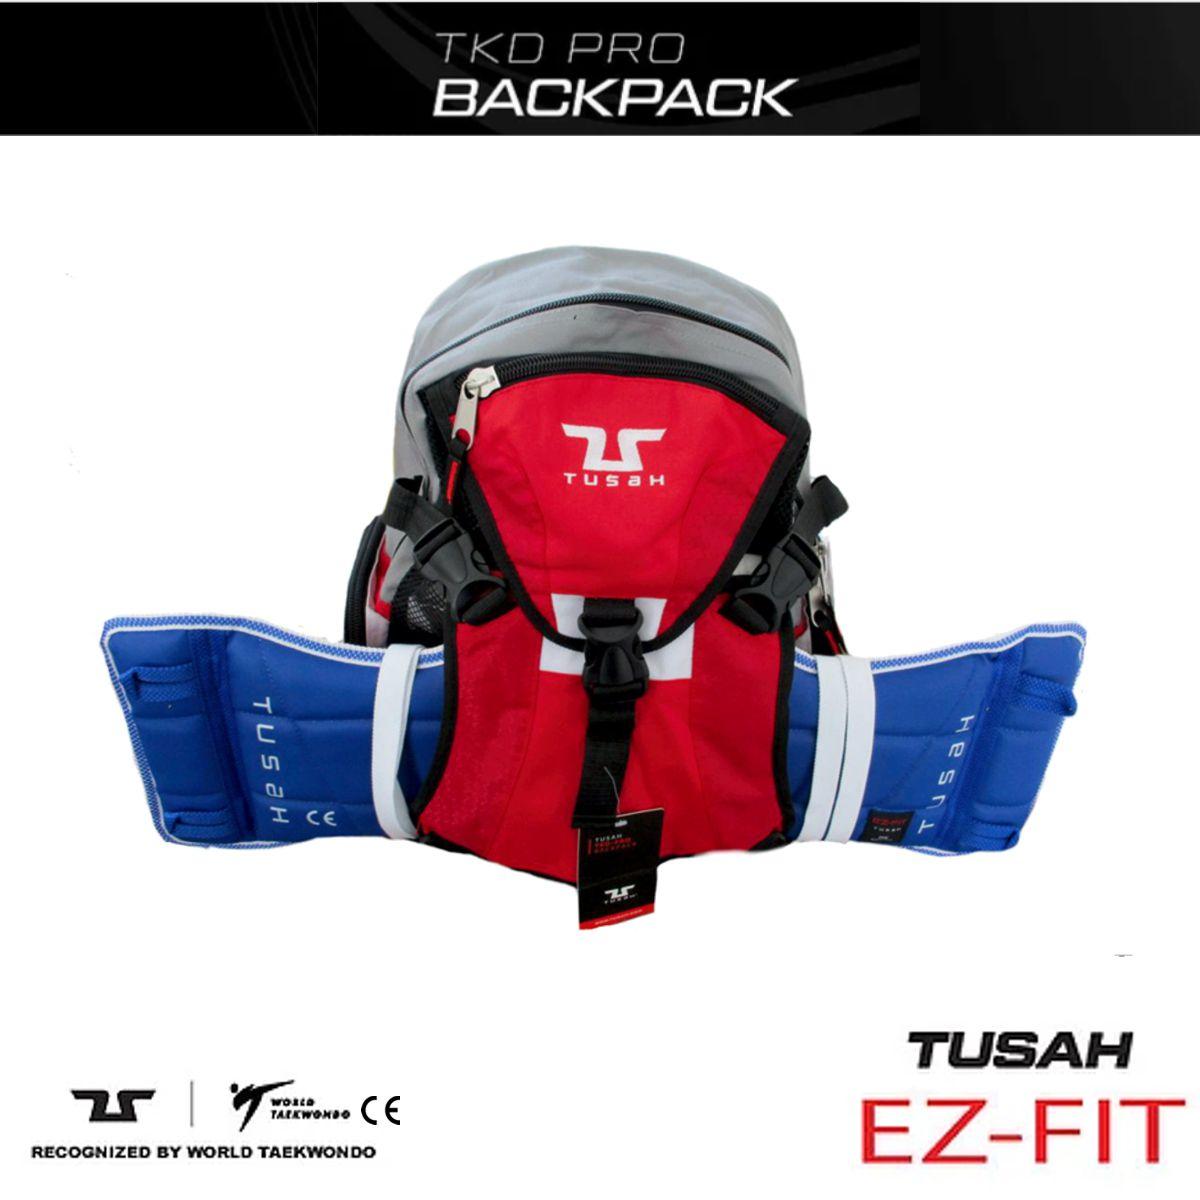 tkd pro back pack